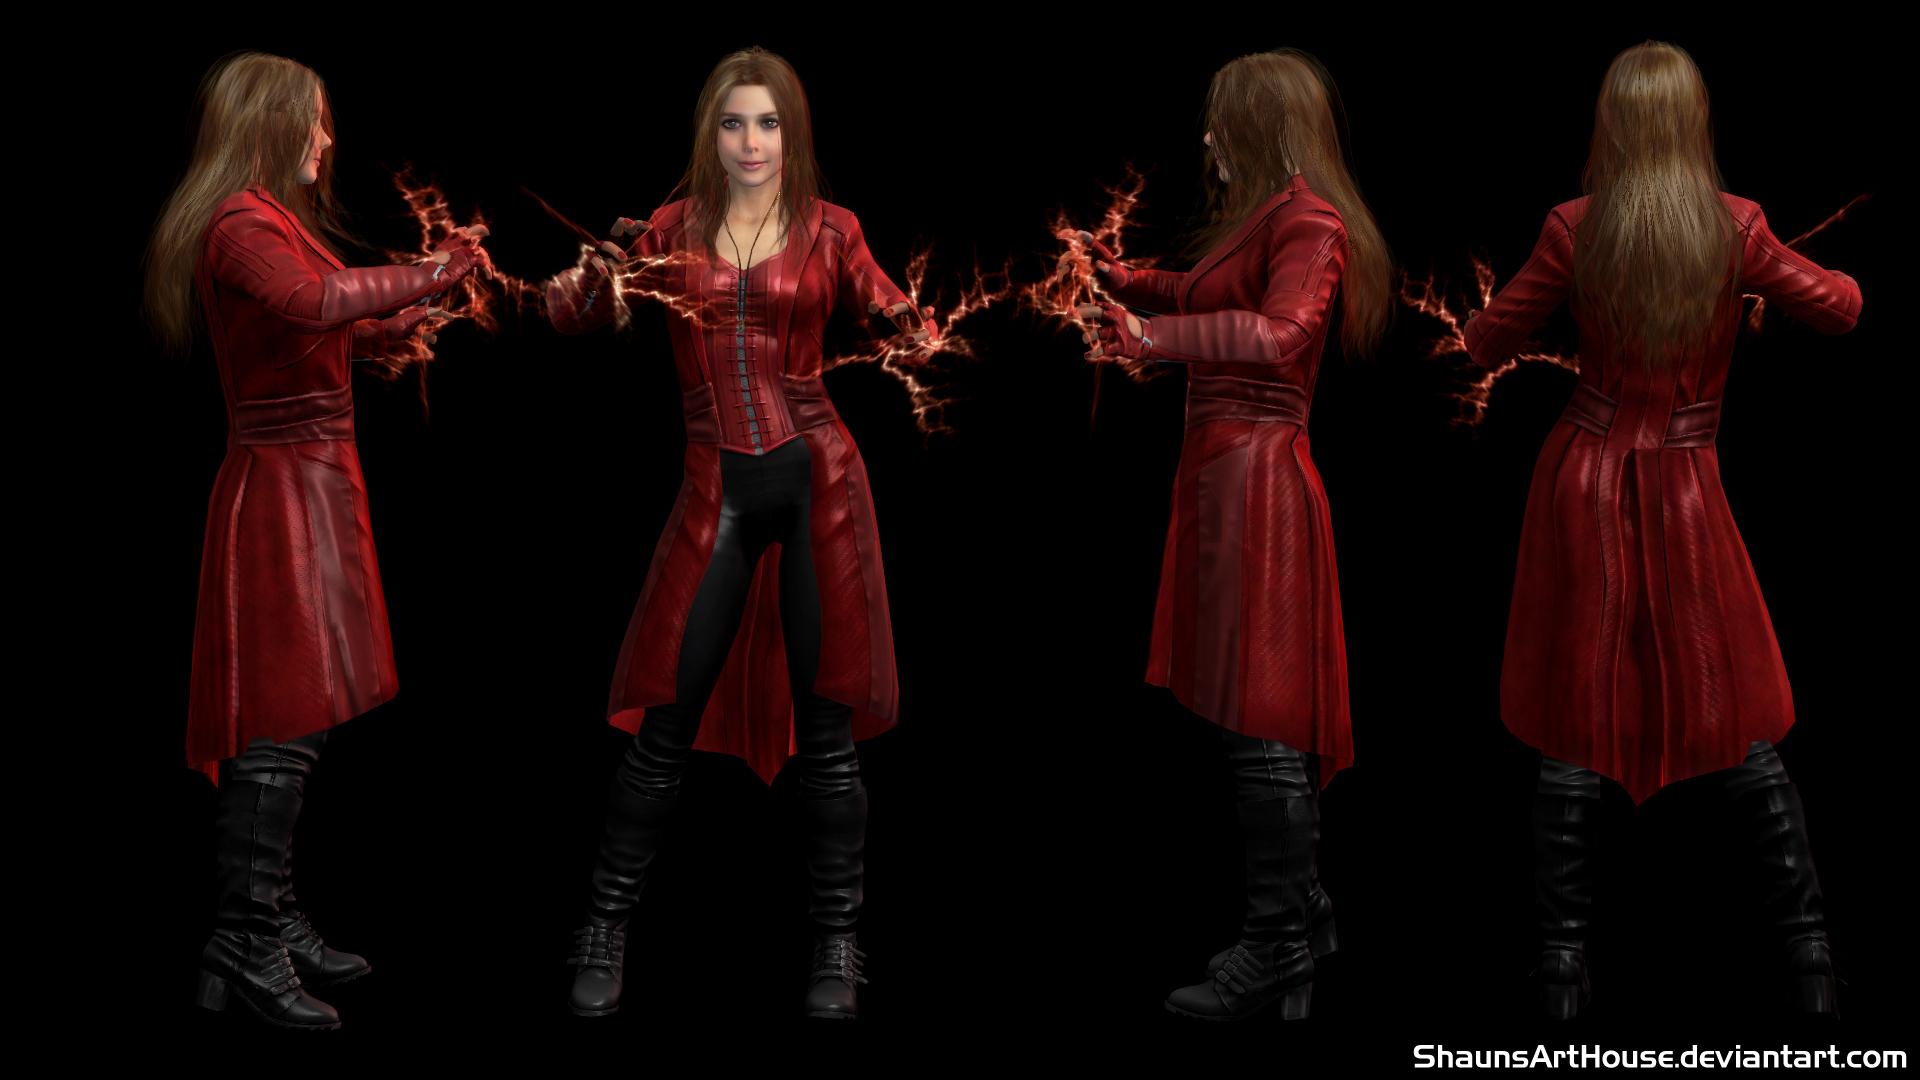 Scarlet Witch CW- Elizabeth Olsen custom 3D model by ShaunsArtHouse